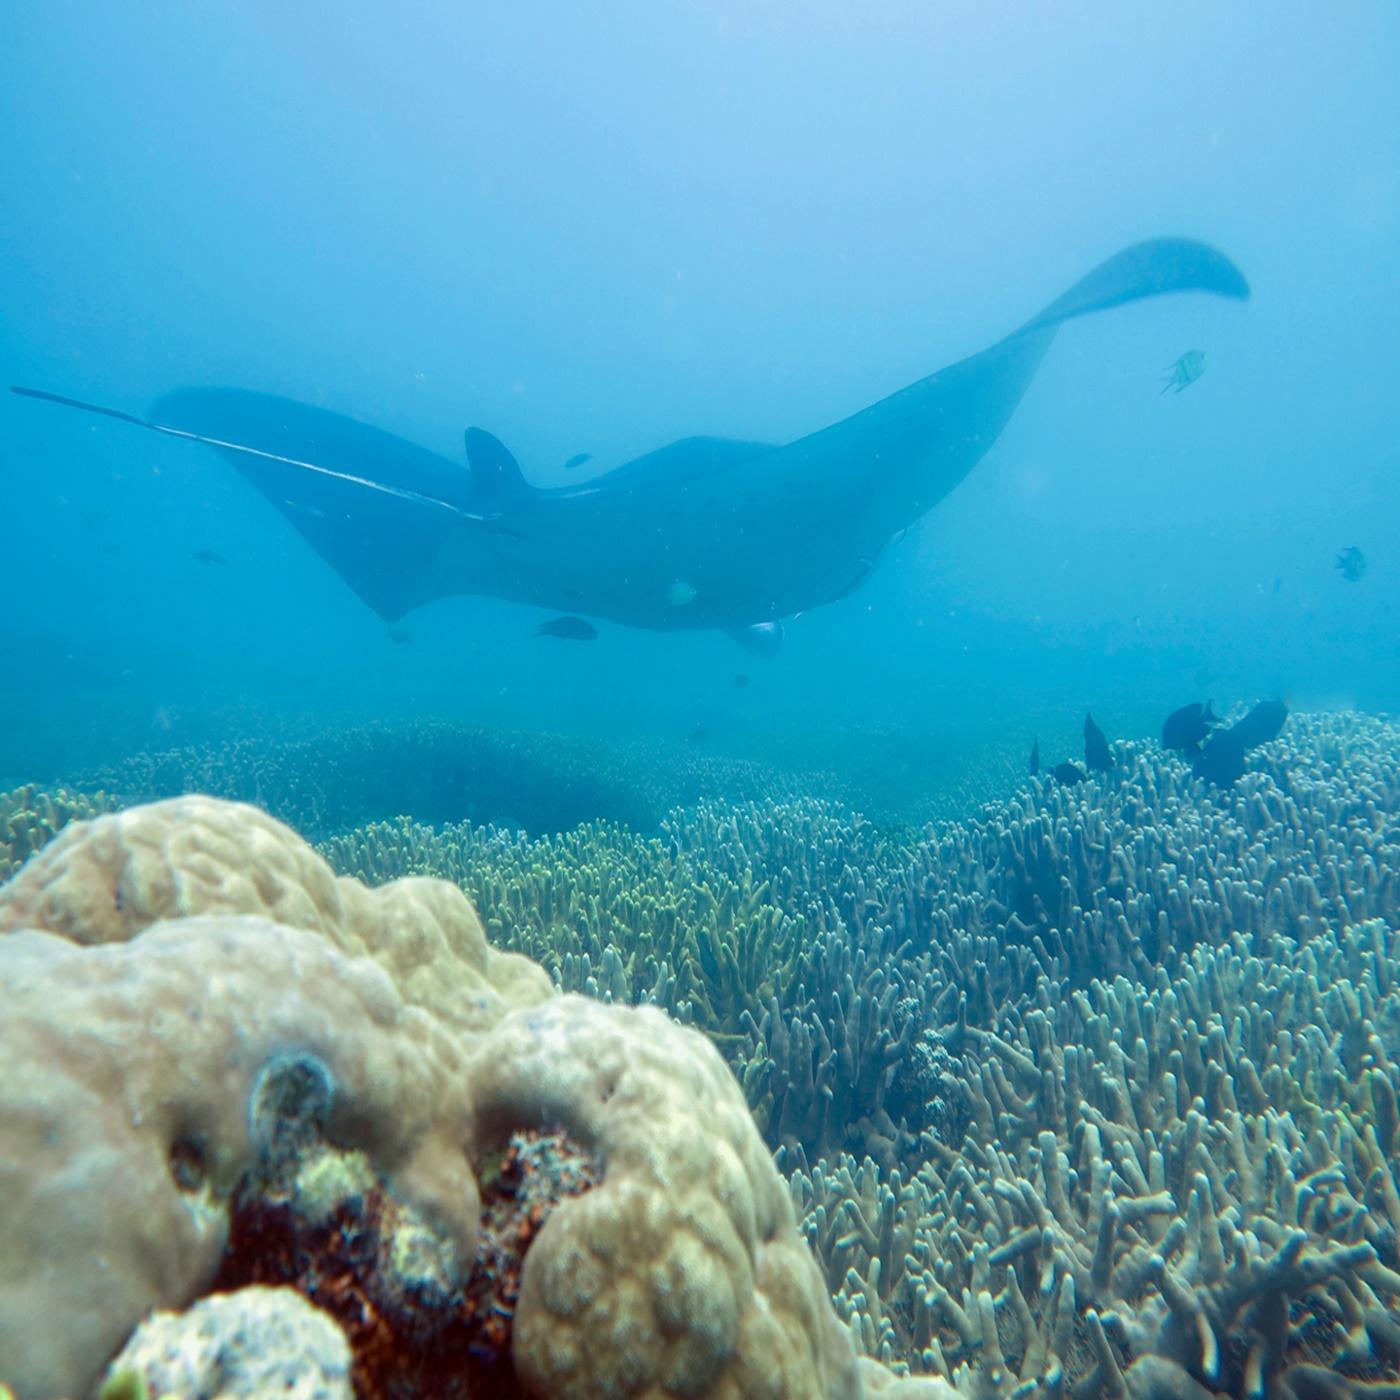 Ep. 3 Cynthia Matzke: Filming a way to Ocean Health